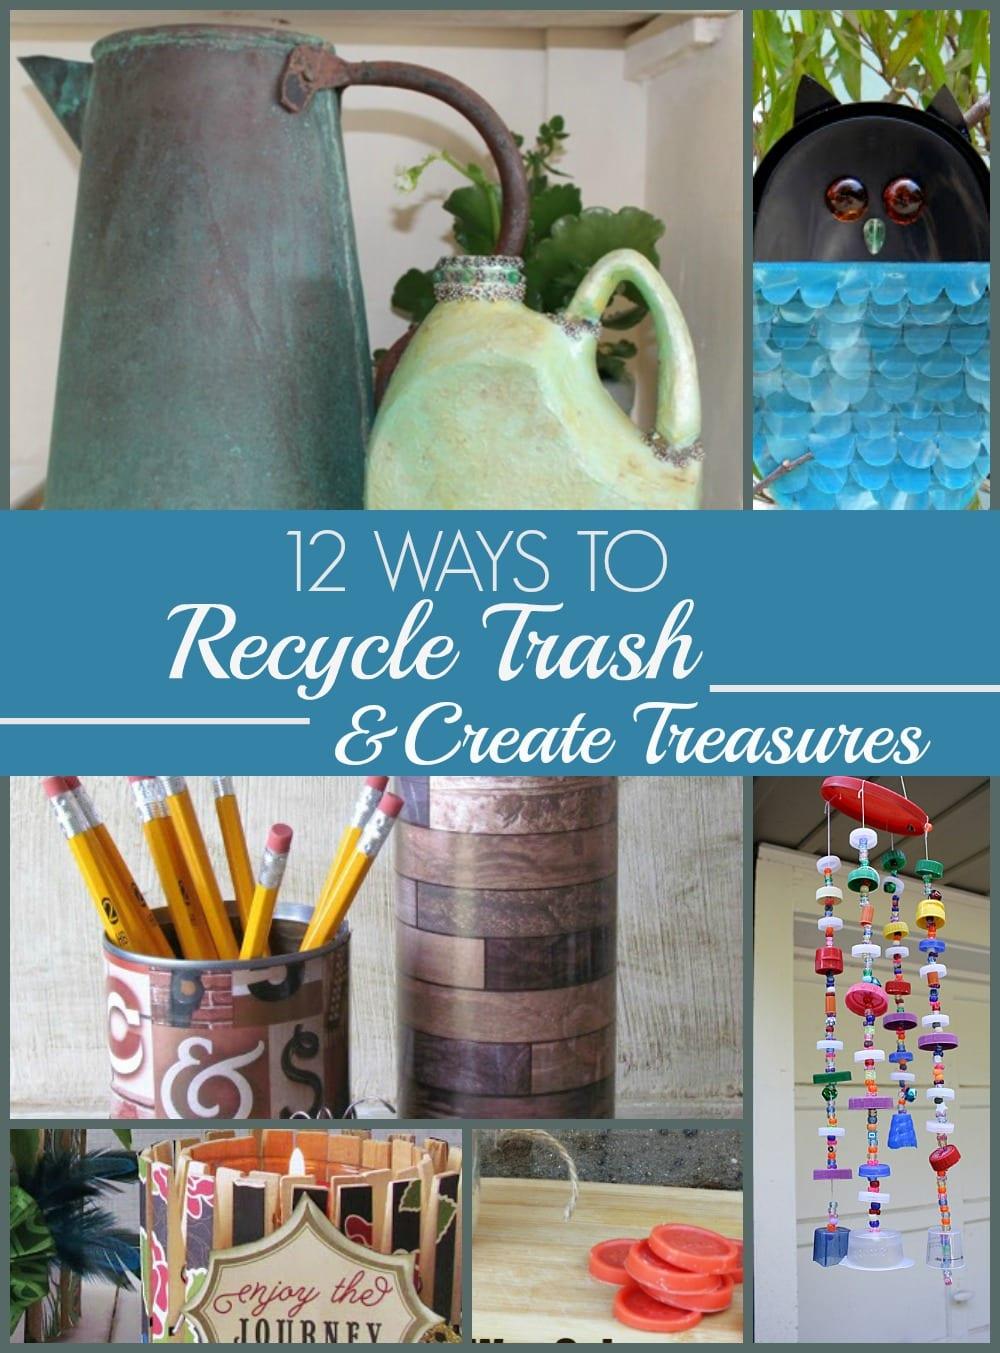 12 Ways To Recycle Trash & Create Treasures